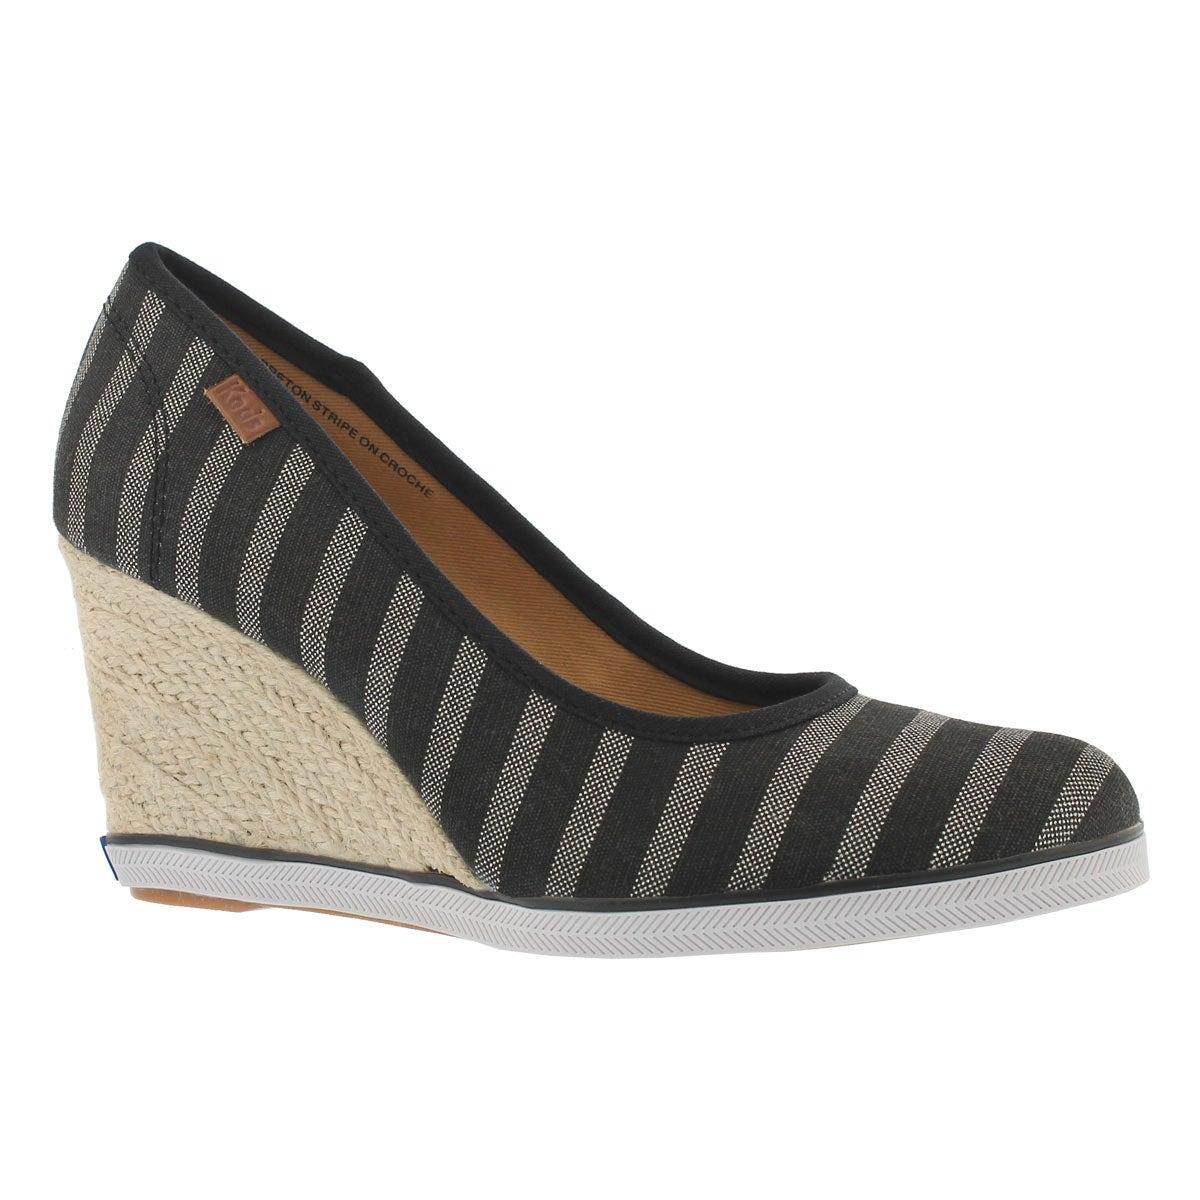 keds s damsel black striped wedge sandals